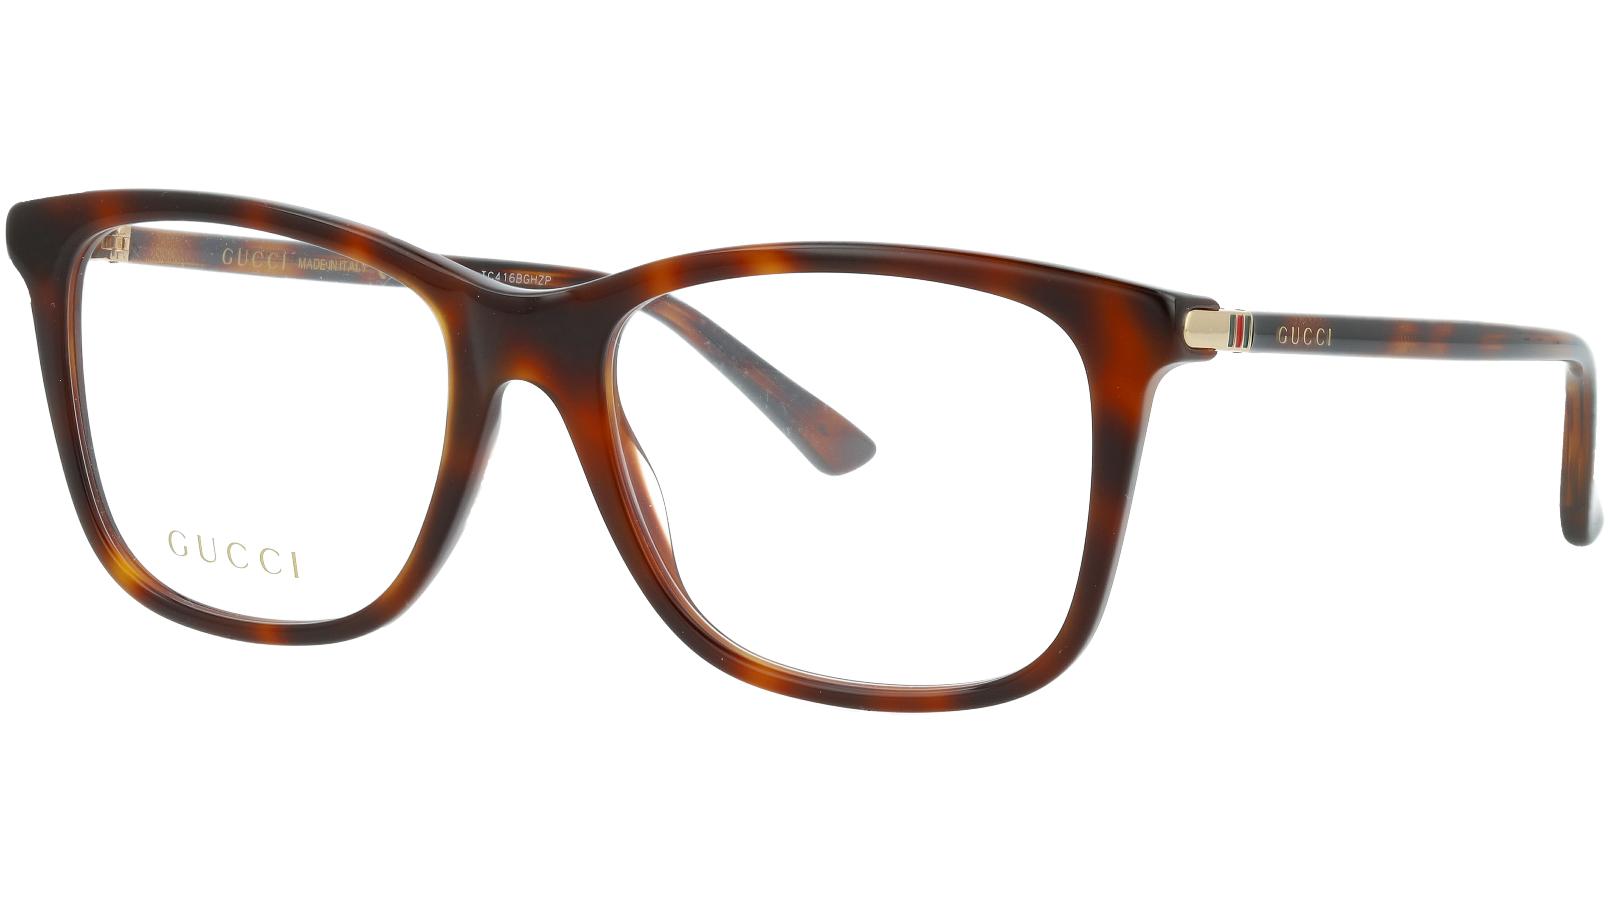 GUCCI GG0018O 006 54 AVANA Glasses